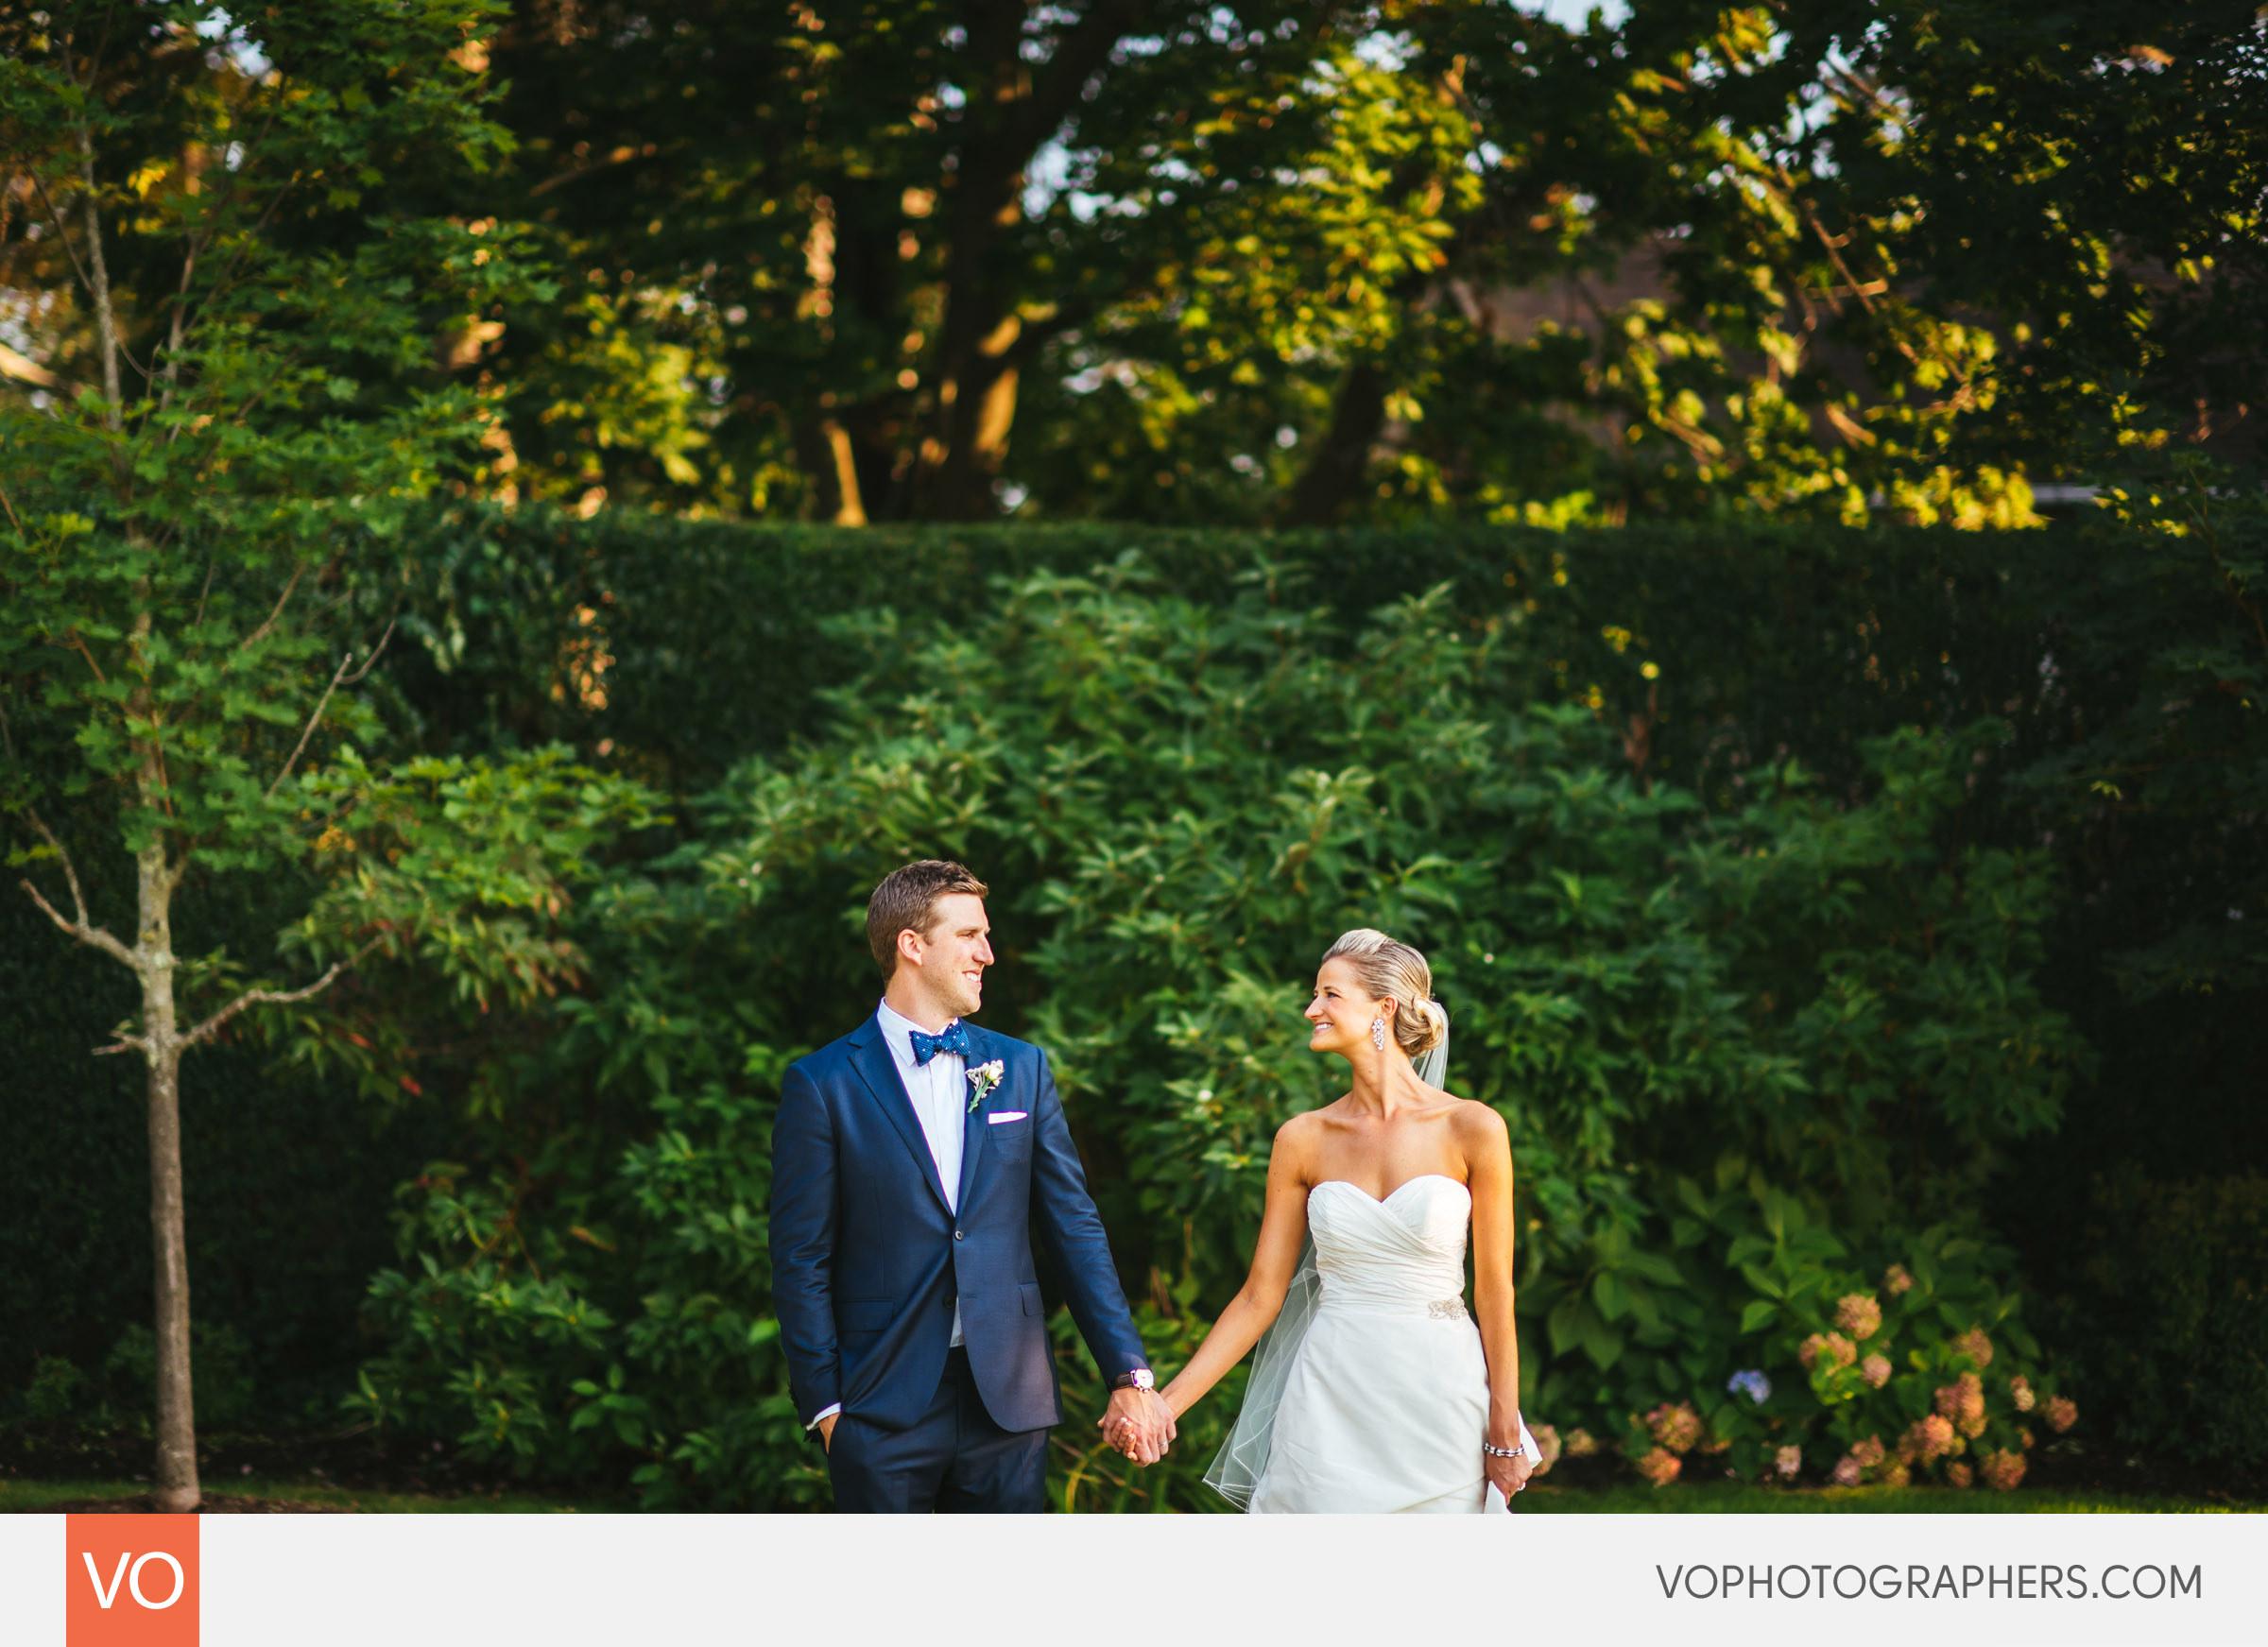 Lizzie-Ted-Stamford-Yacht-Club-Wedding-0036